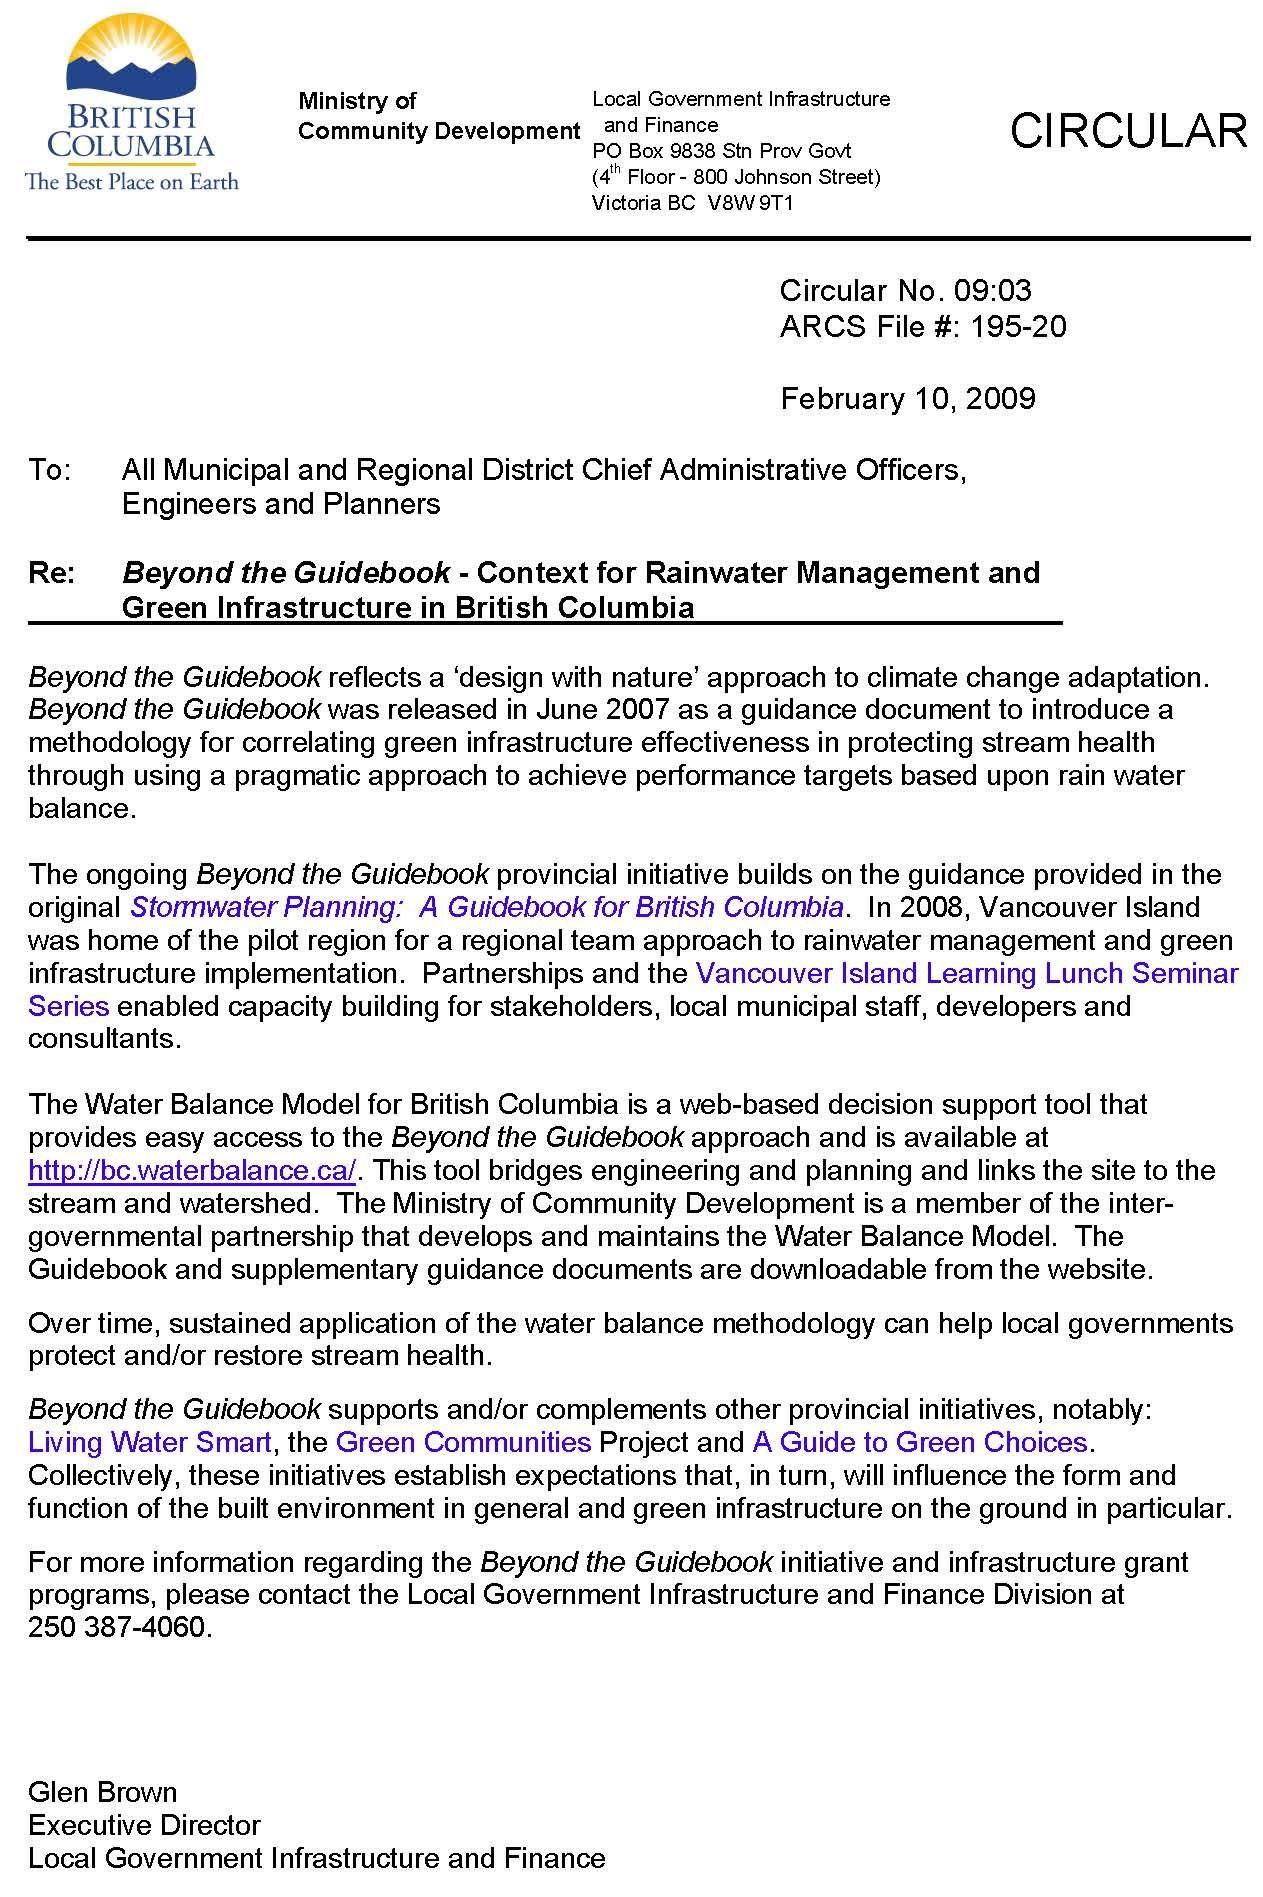 MCD_BeyondGuidebookCircular_Feb2009_trimmed